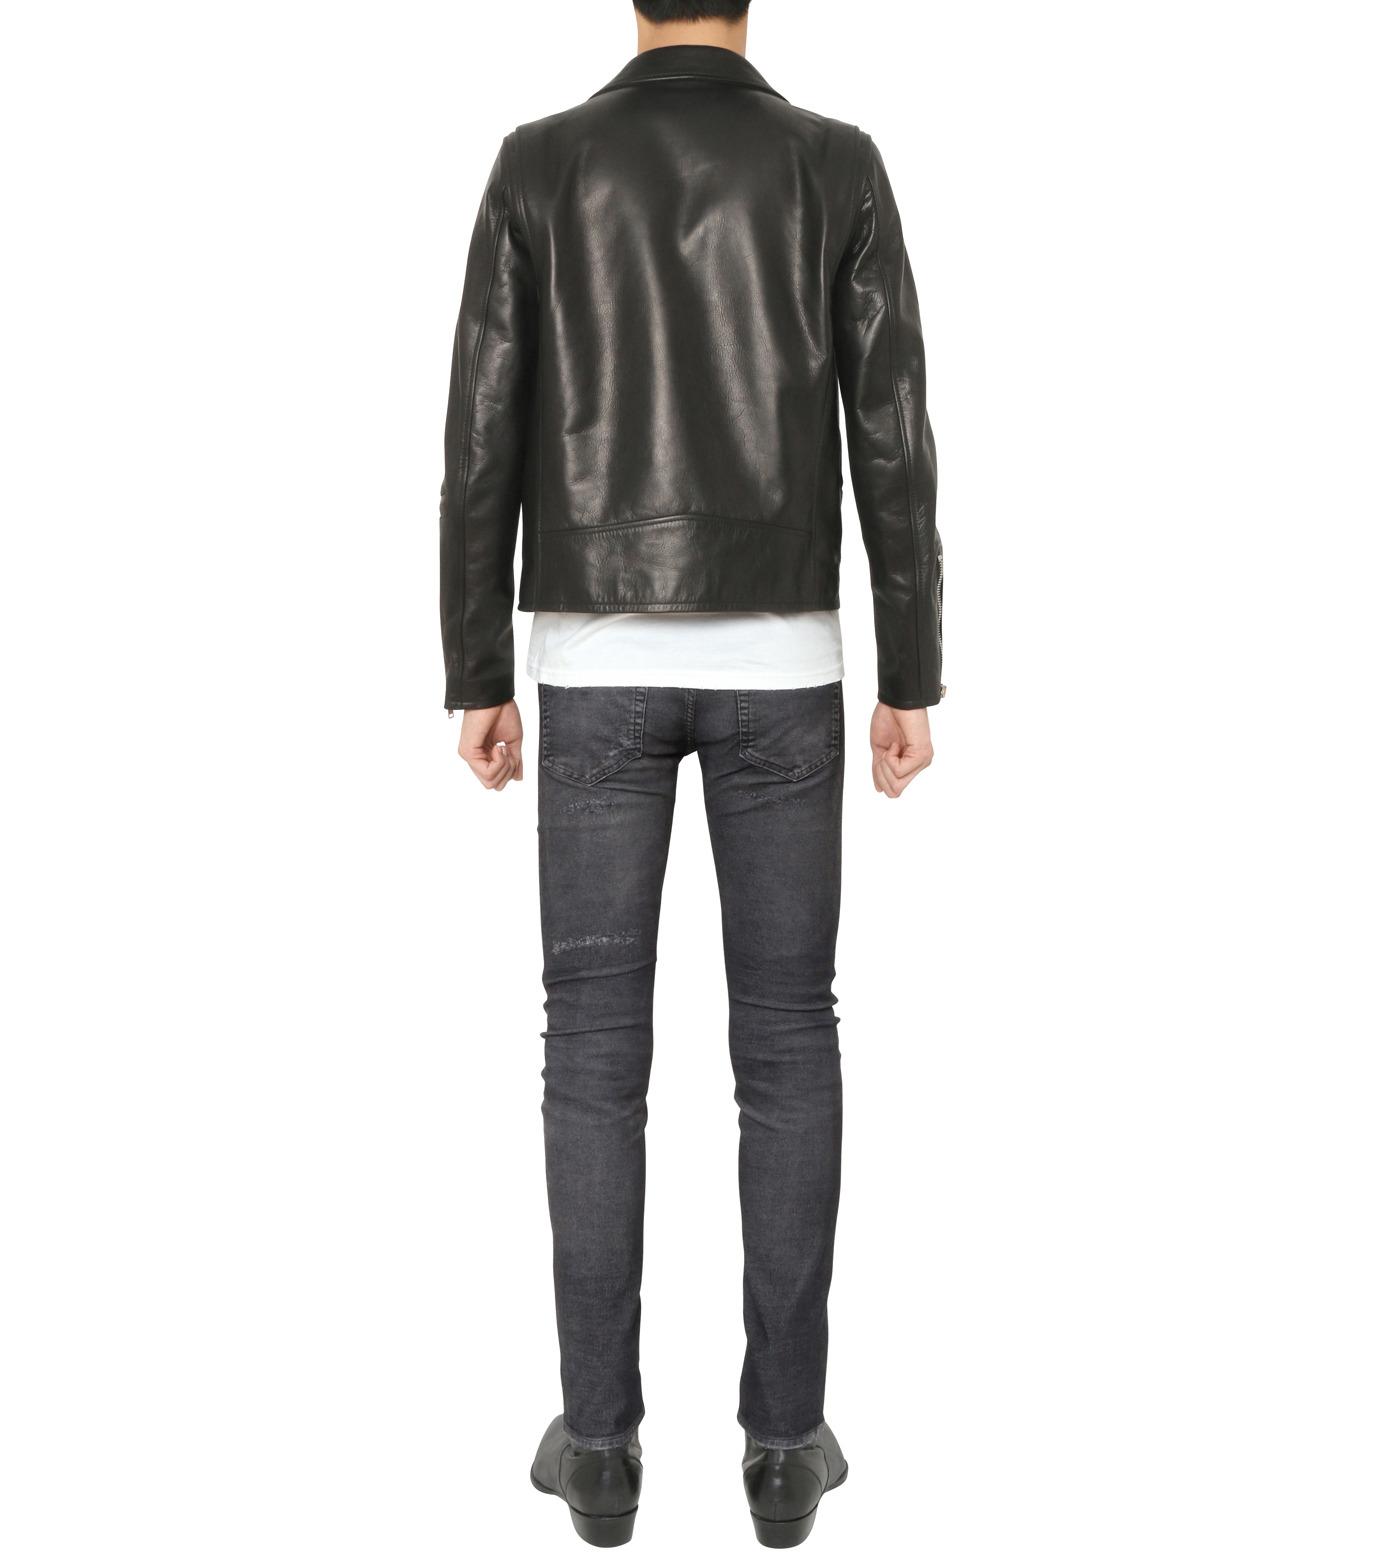 HL HEDDIE LOVU(エイチエル・エディールーヴ)のSEMI DOUBLE RIDERS JACKET-BLACK(ジャケット/jacket)-18A94001-13 拡大詳細画像3